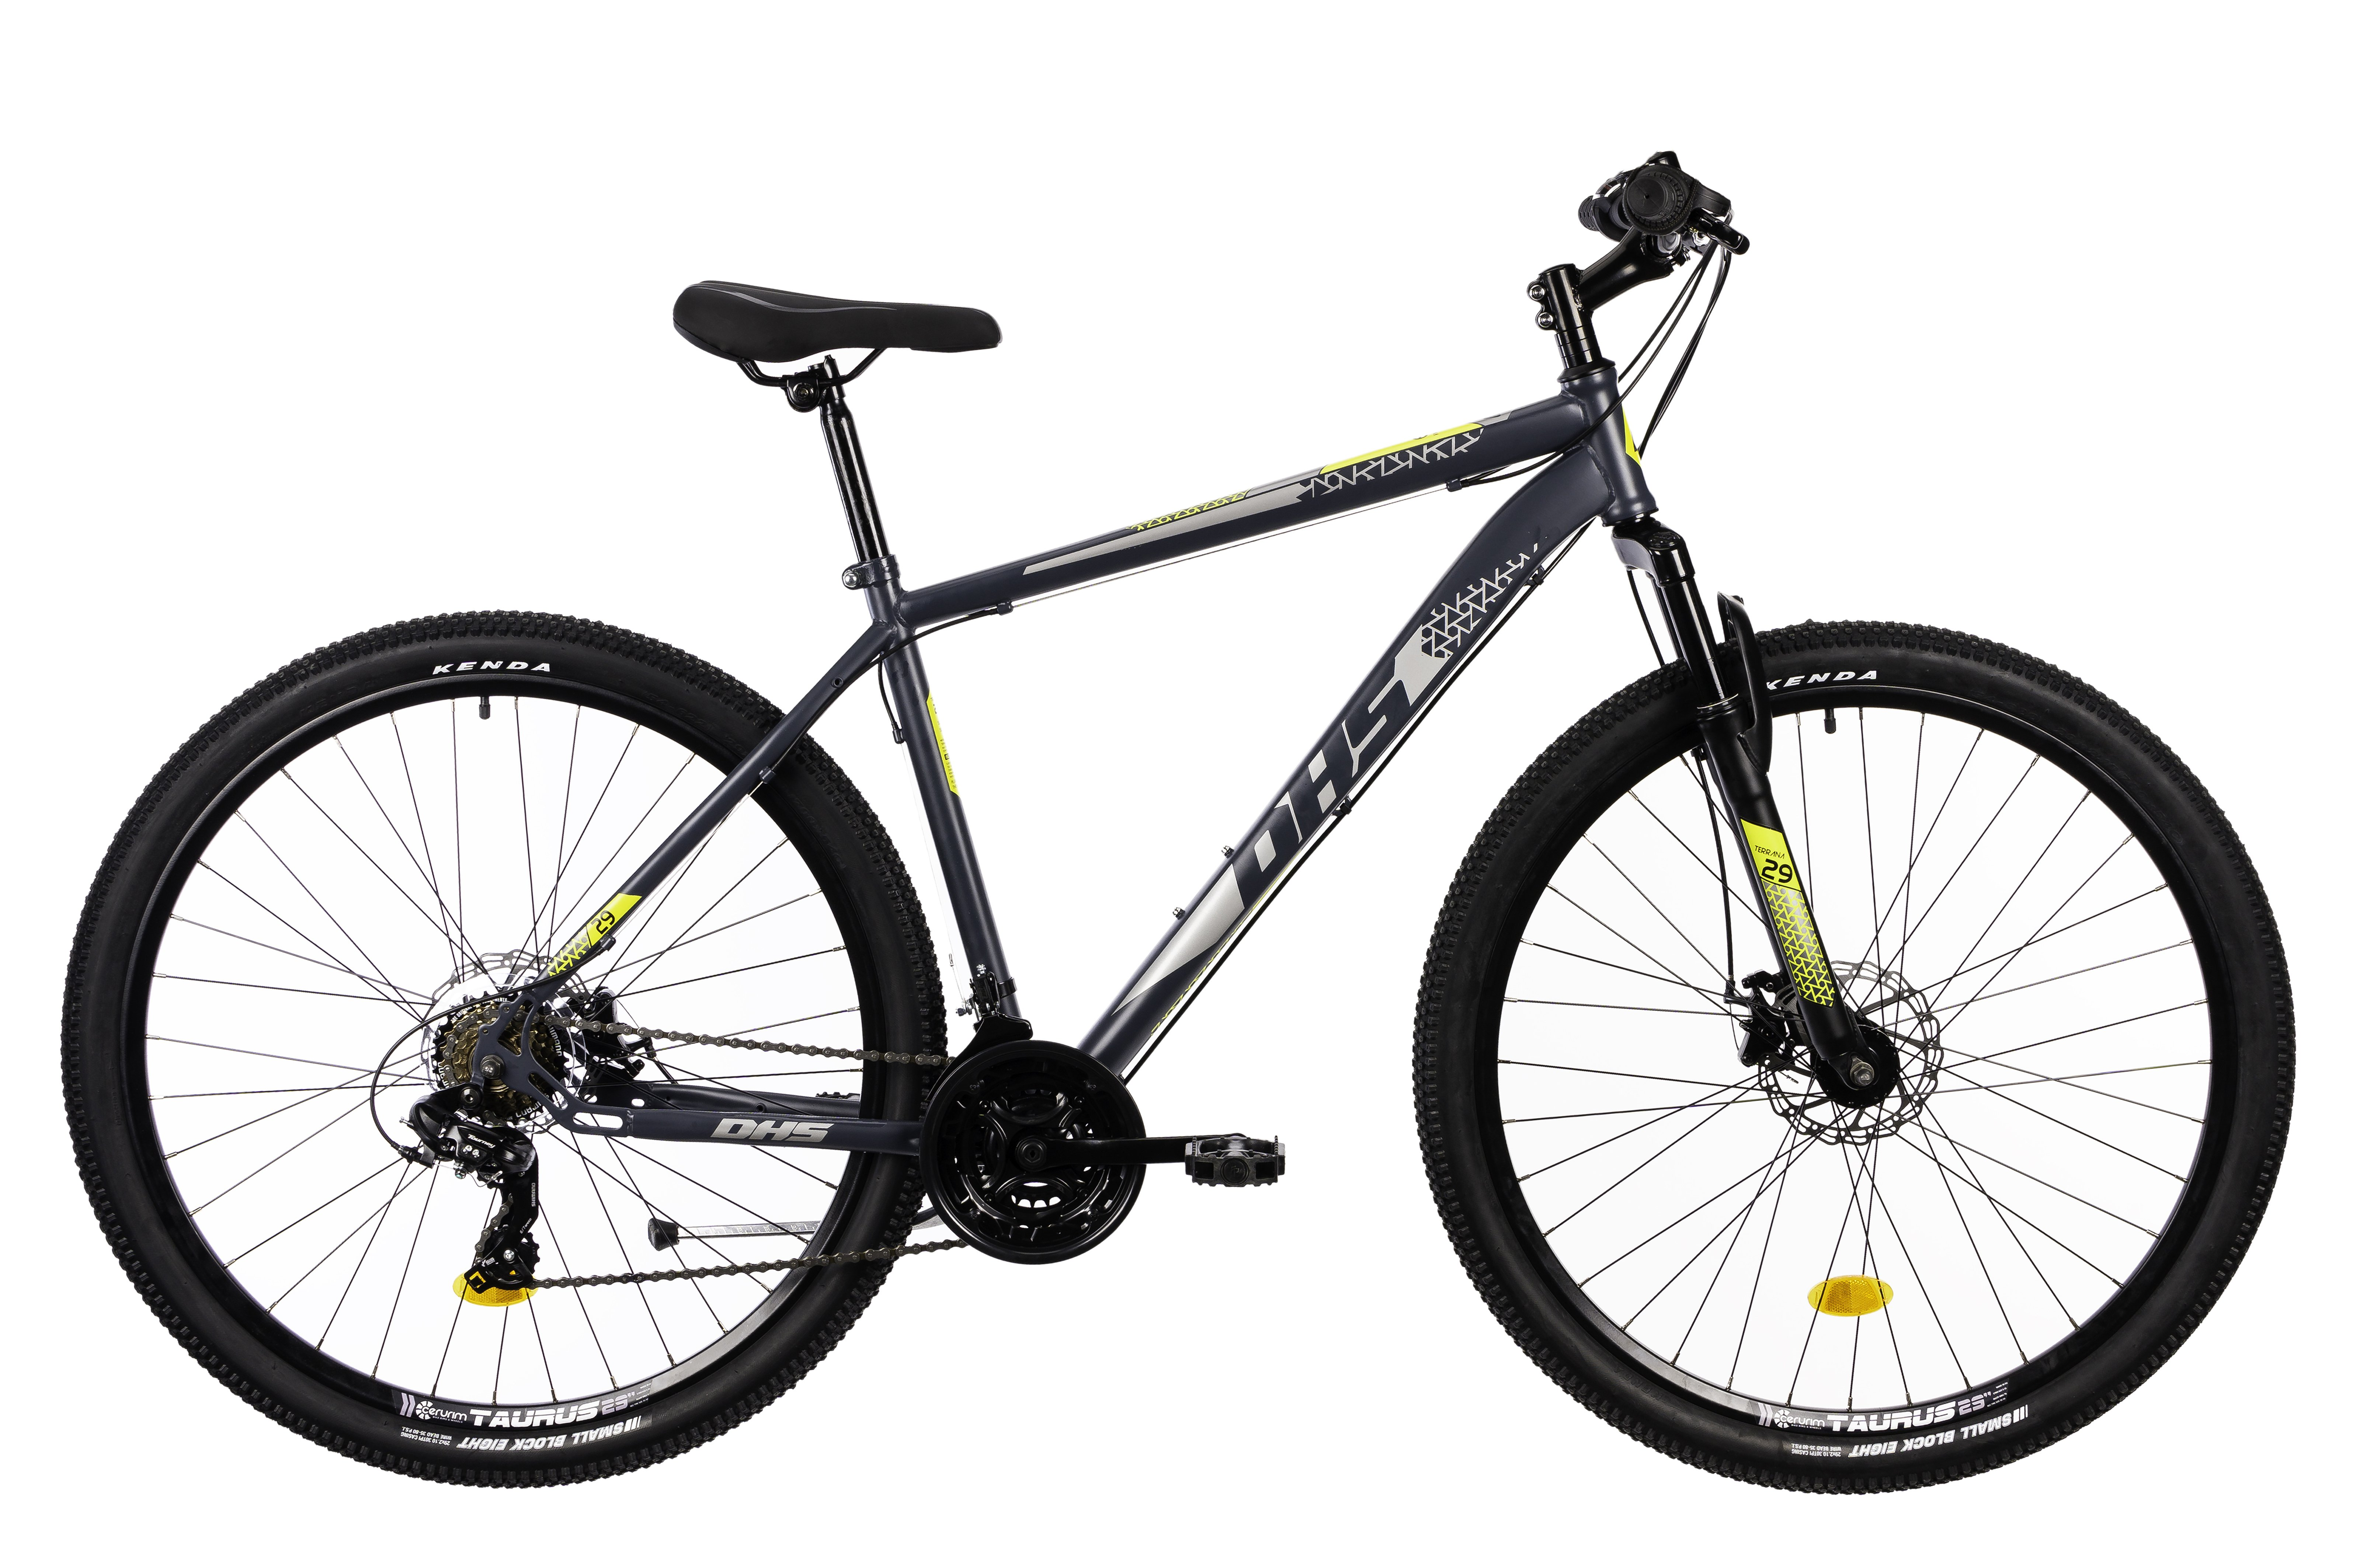 Bicicleta Mtb Terrana 2905 - 29 Inch, M, Gri [14]